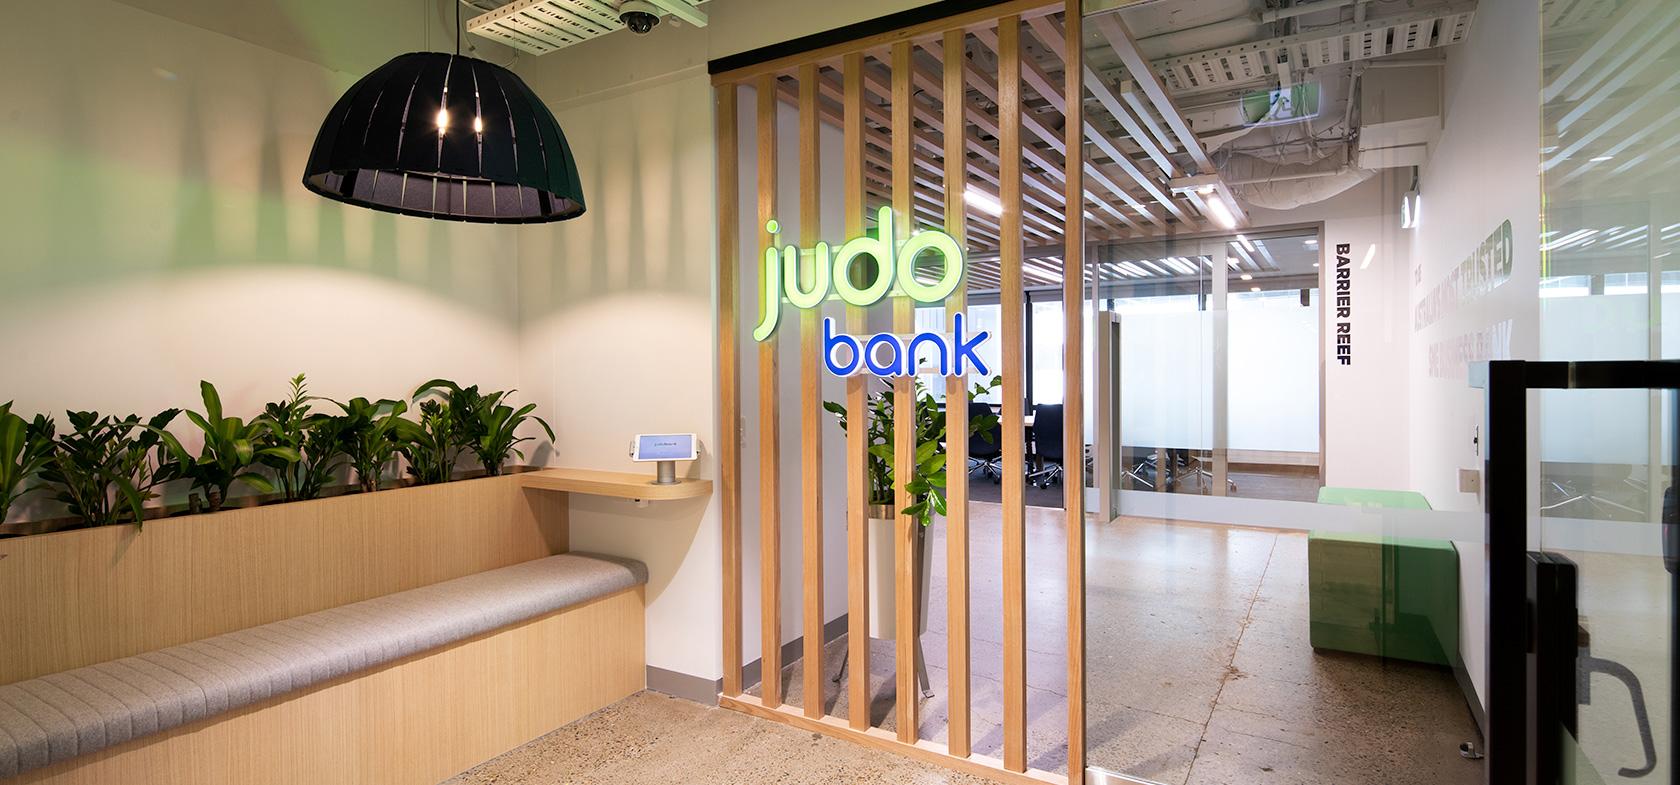 schiavello construction brisbane judo bank office fitout header banner